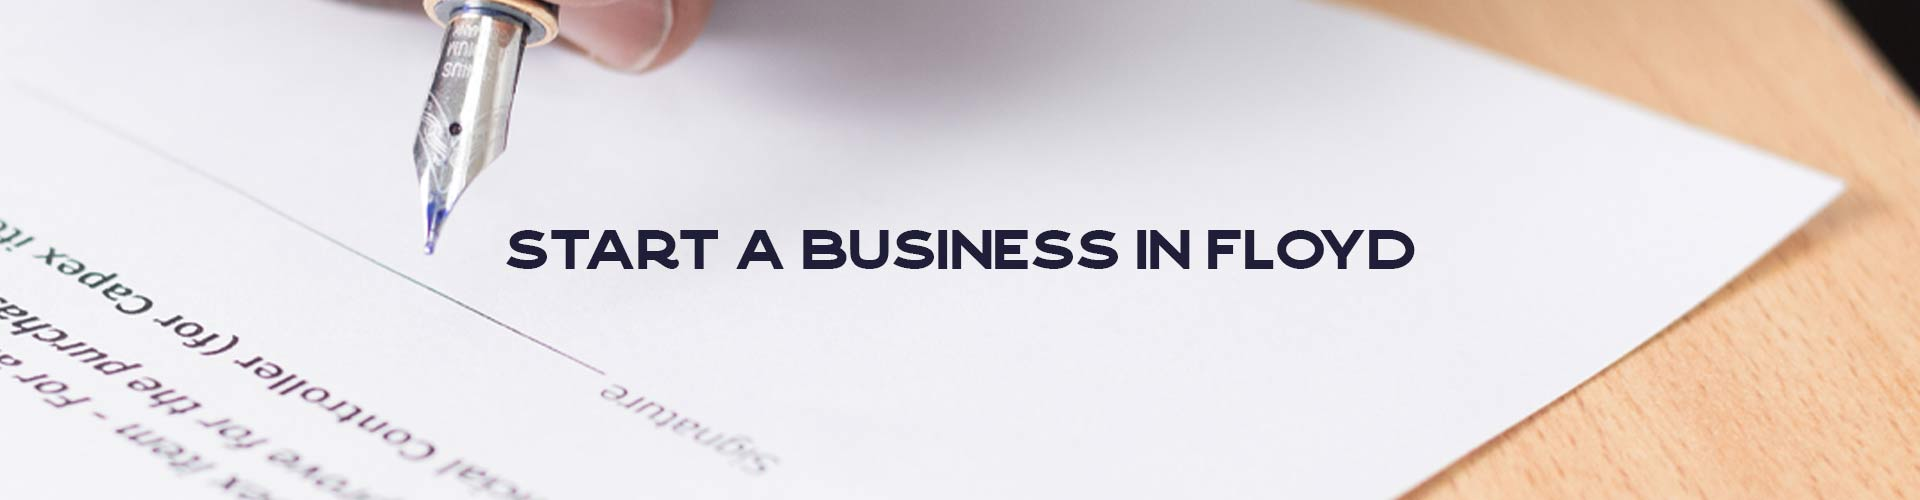 start-business-header